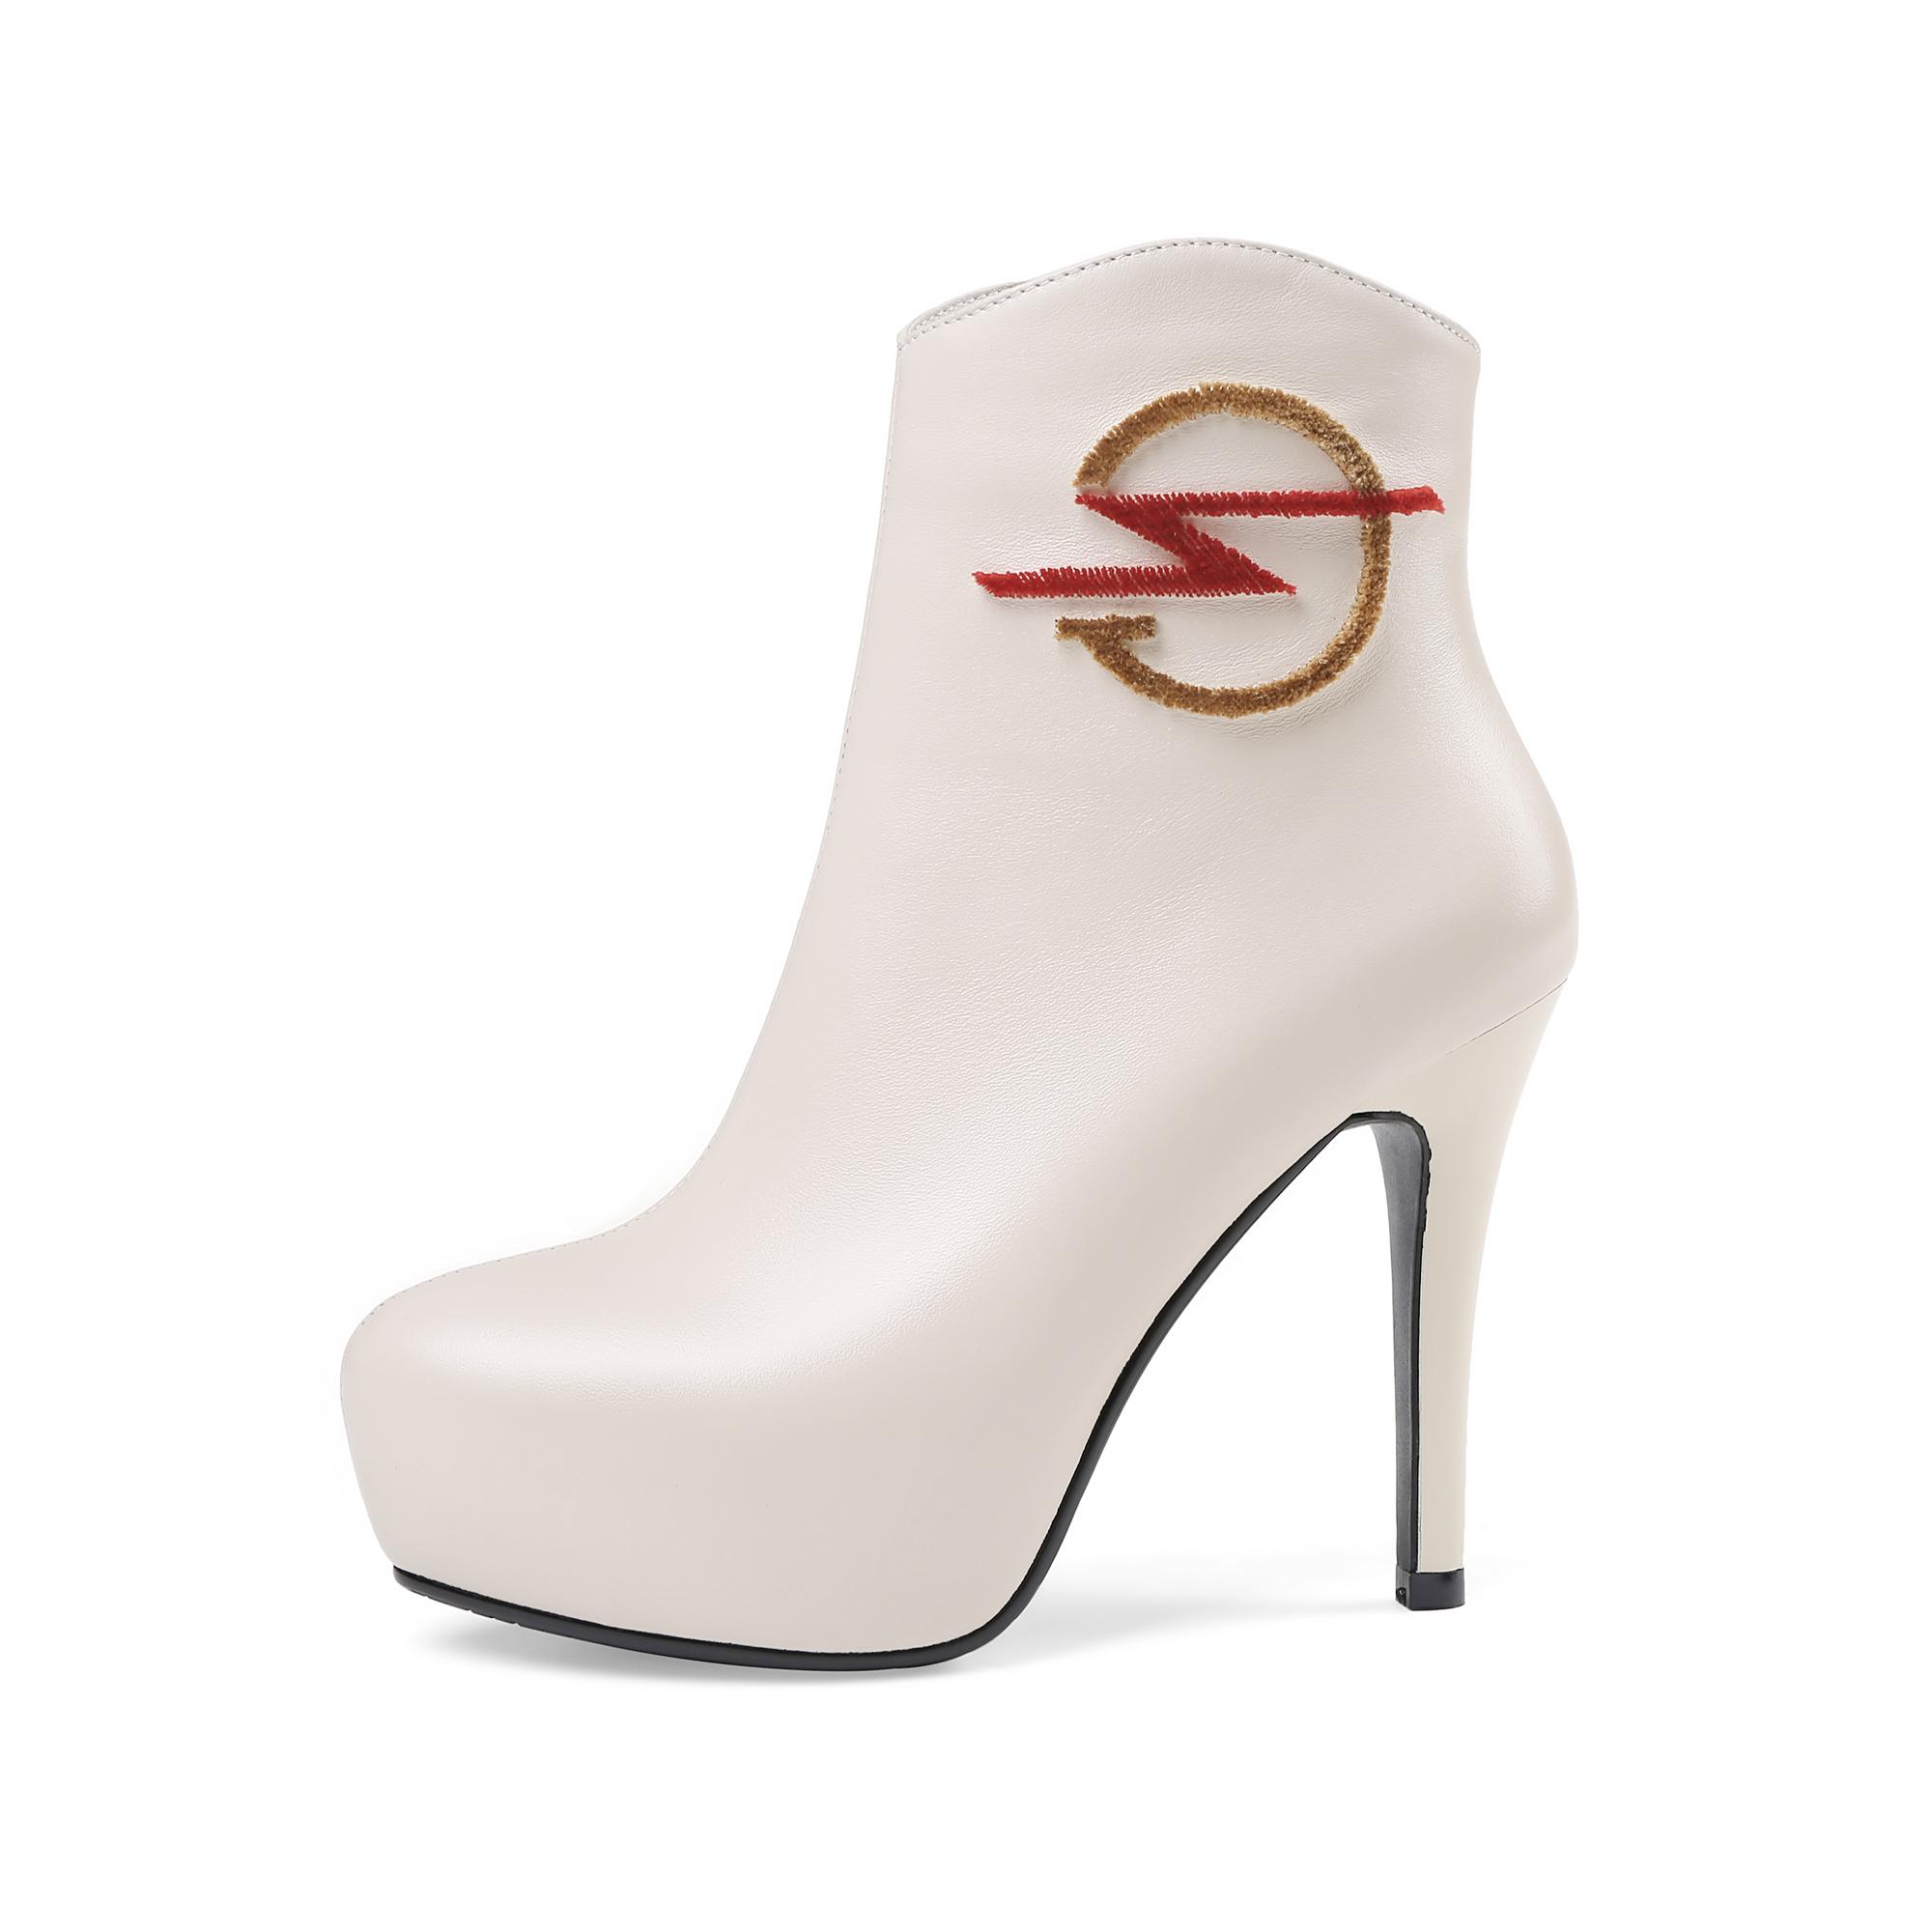 7eb36994eea US  65 - Arden Furtado 2018 new style spring autumn platform sexy high heels  12cm woman stilettos women shoes genuine leather ankle boots night club  shoes ...